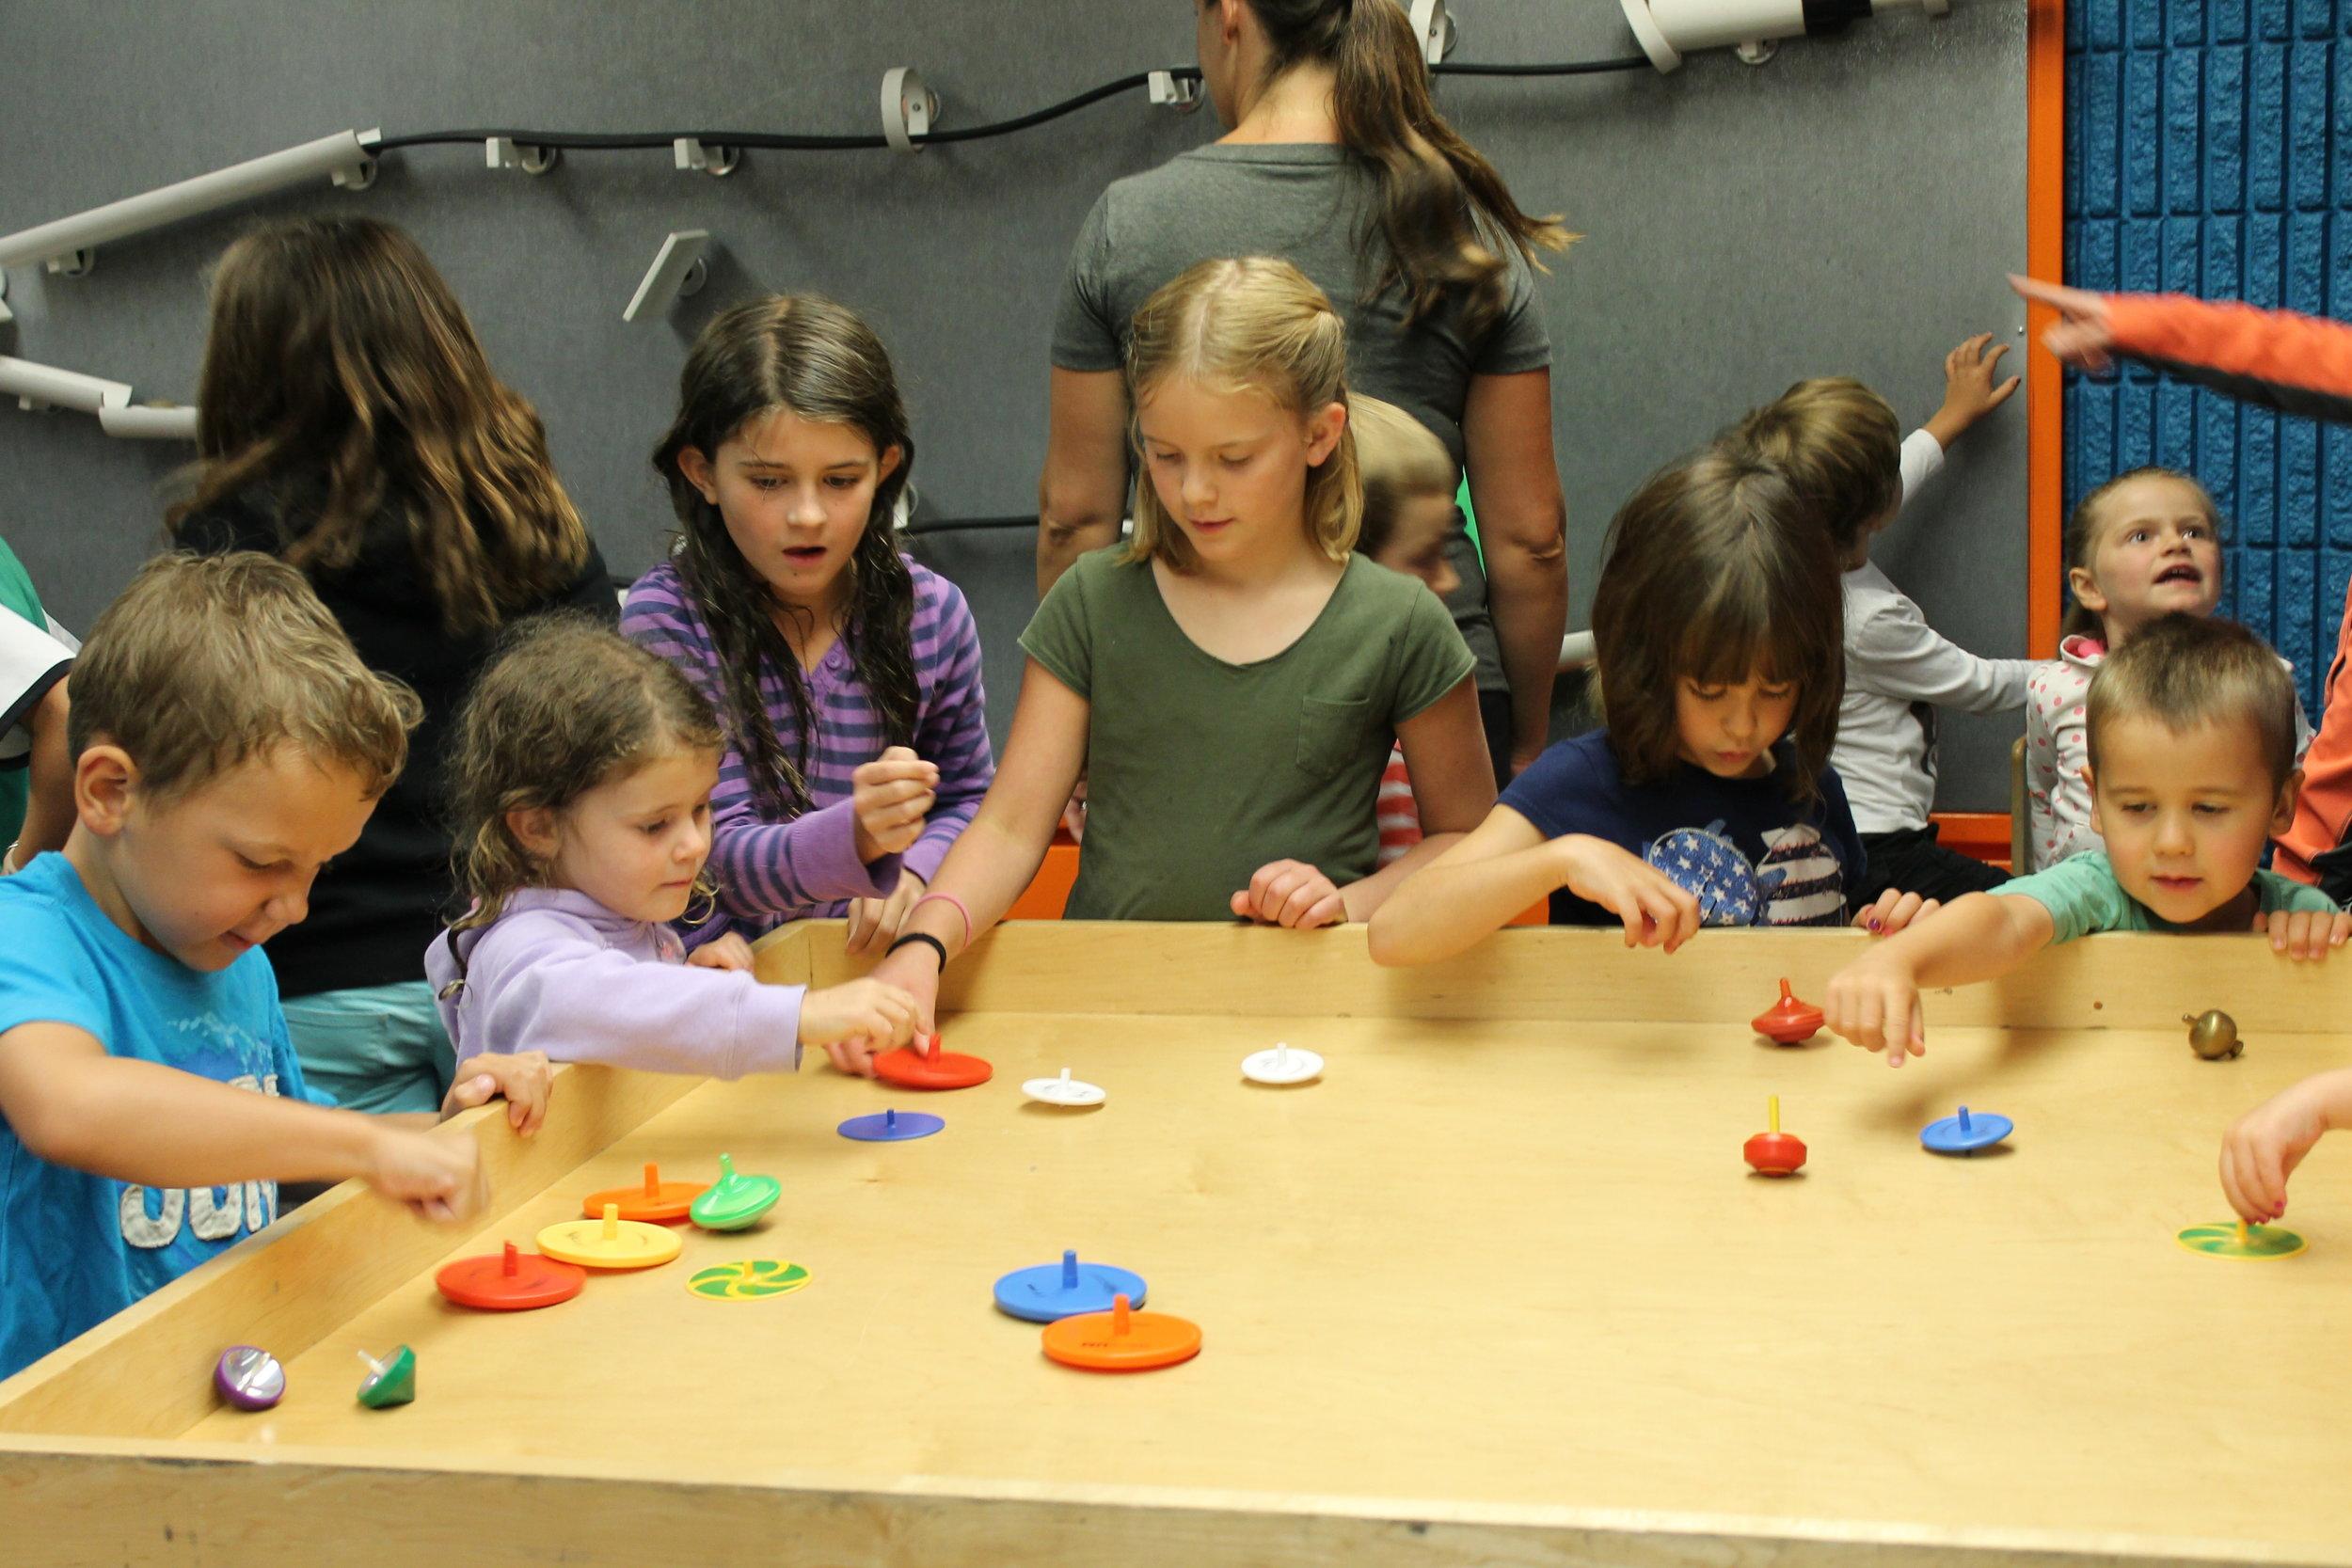 17.4.27 kids spinning tops.JPG